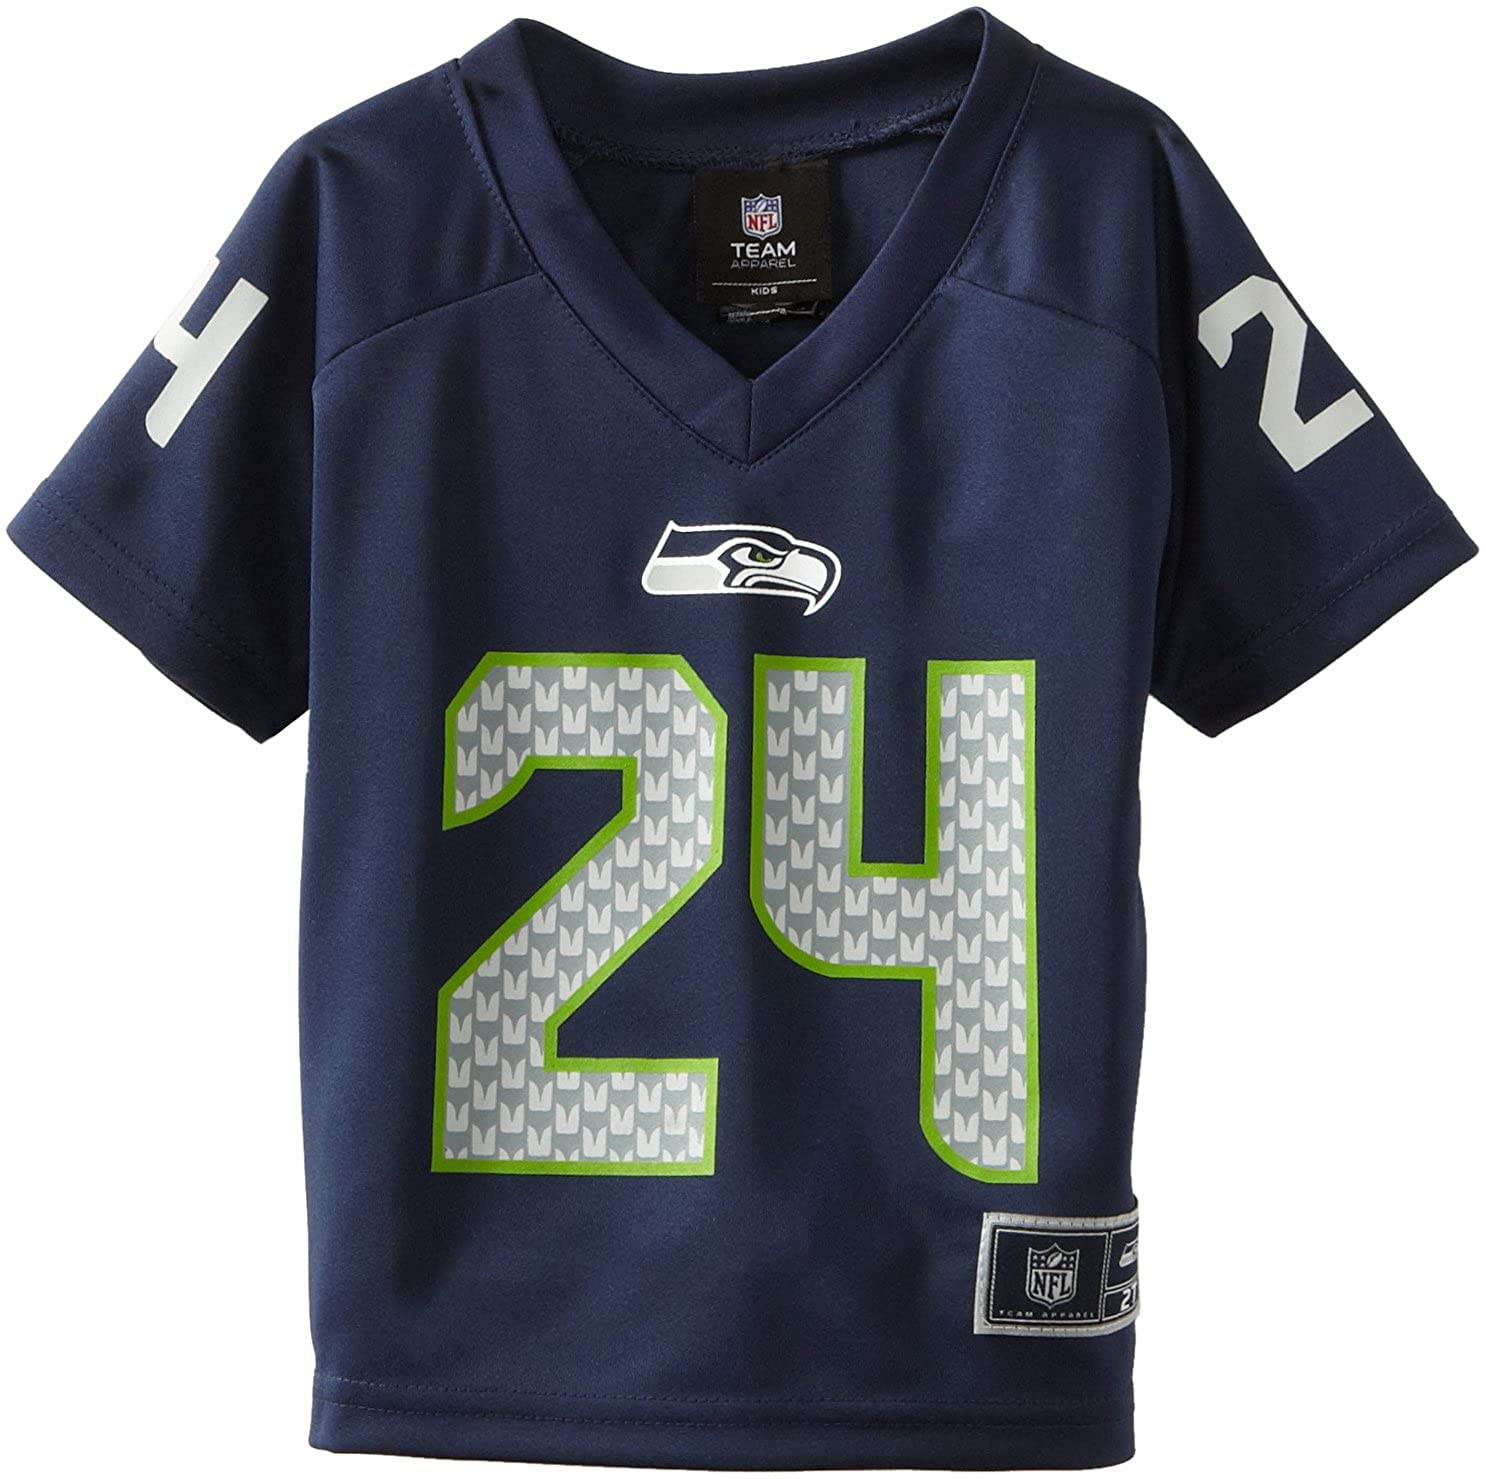 wholesale dealer fee35 64e0e NFL Seattle Seahawks Marshawn Lynch Toddler Player Replica Jersey